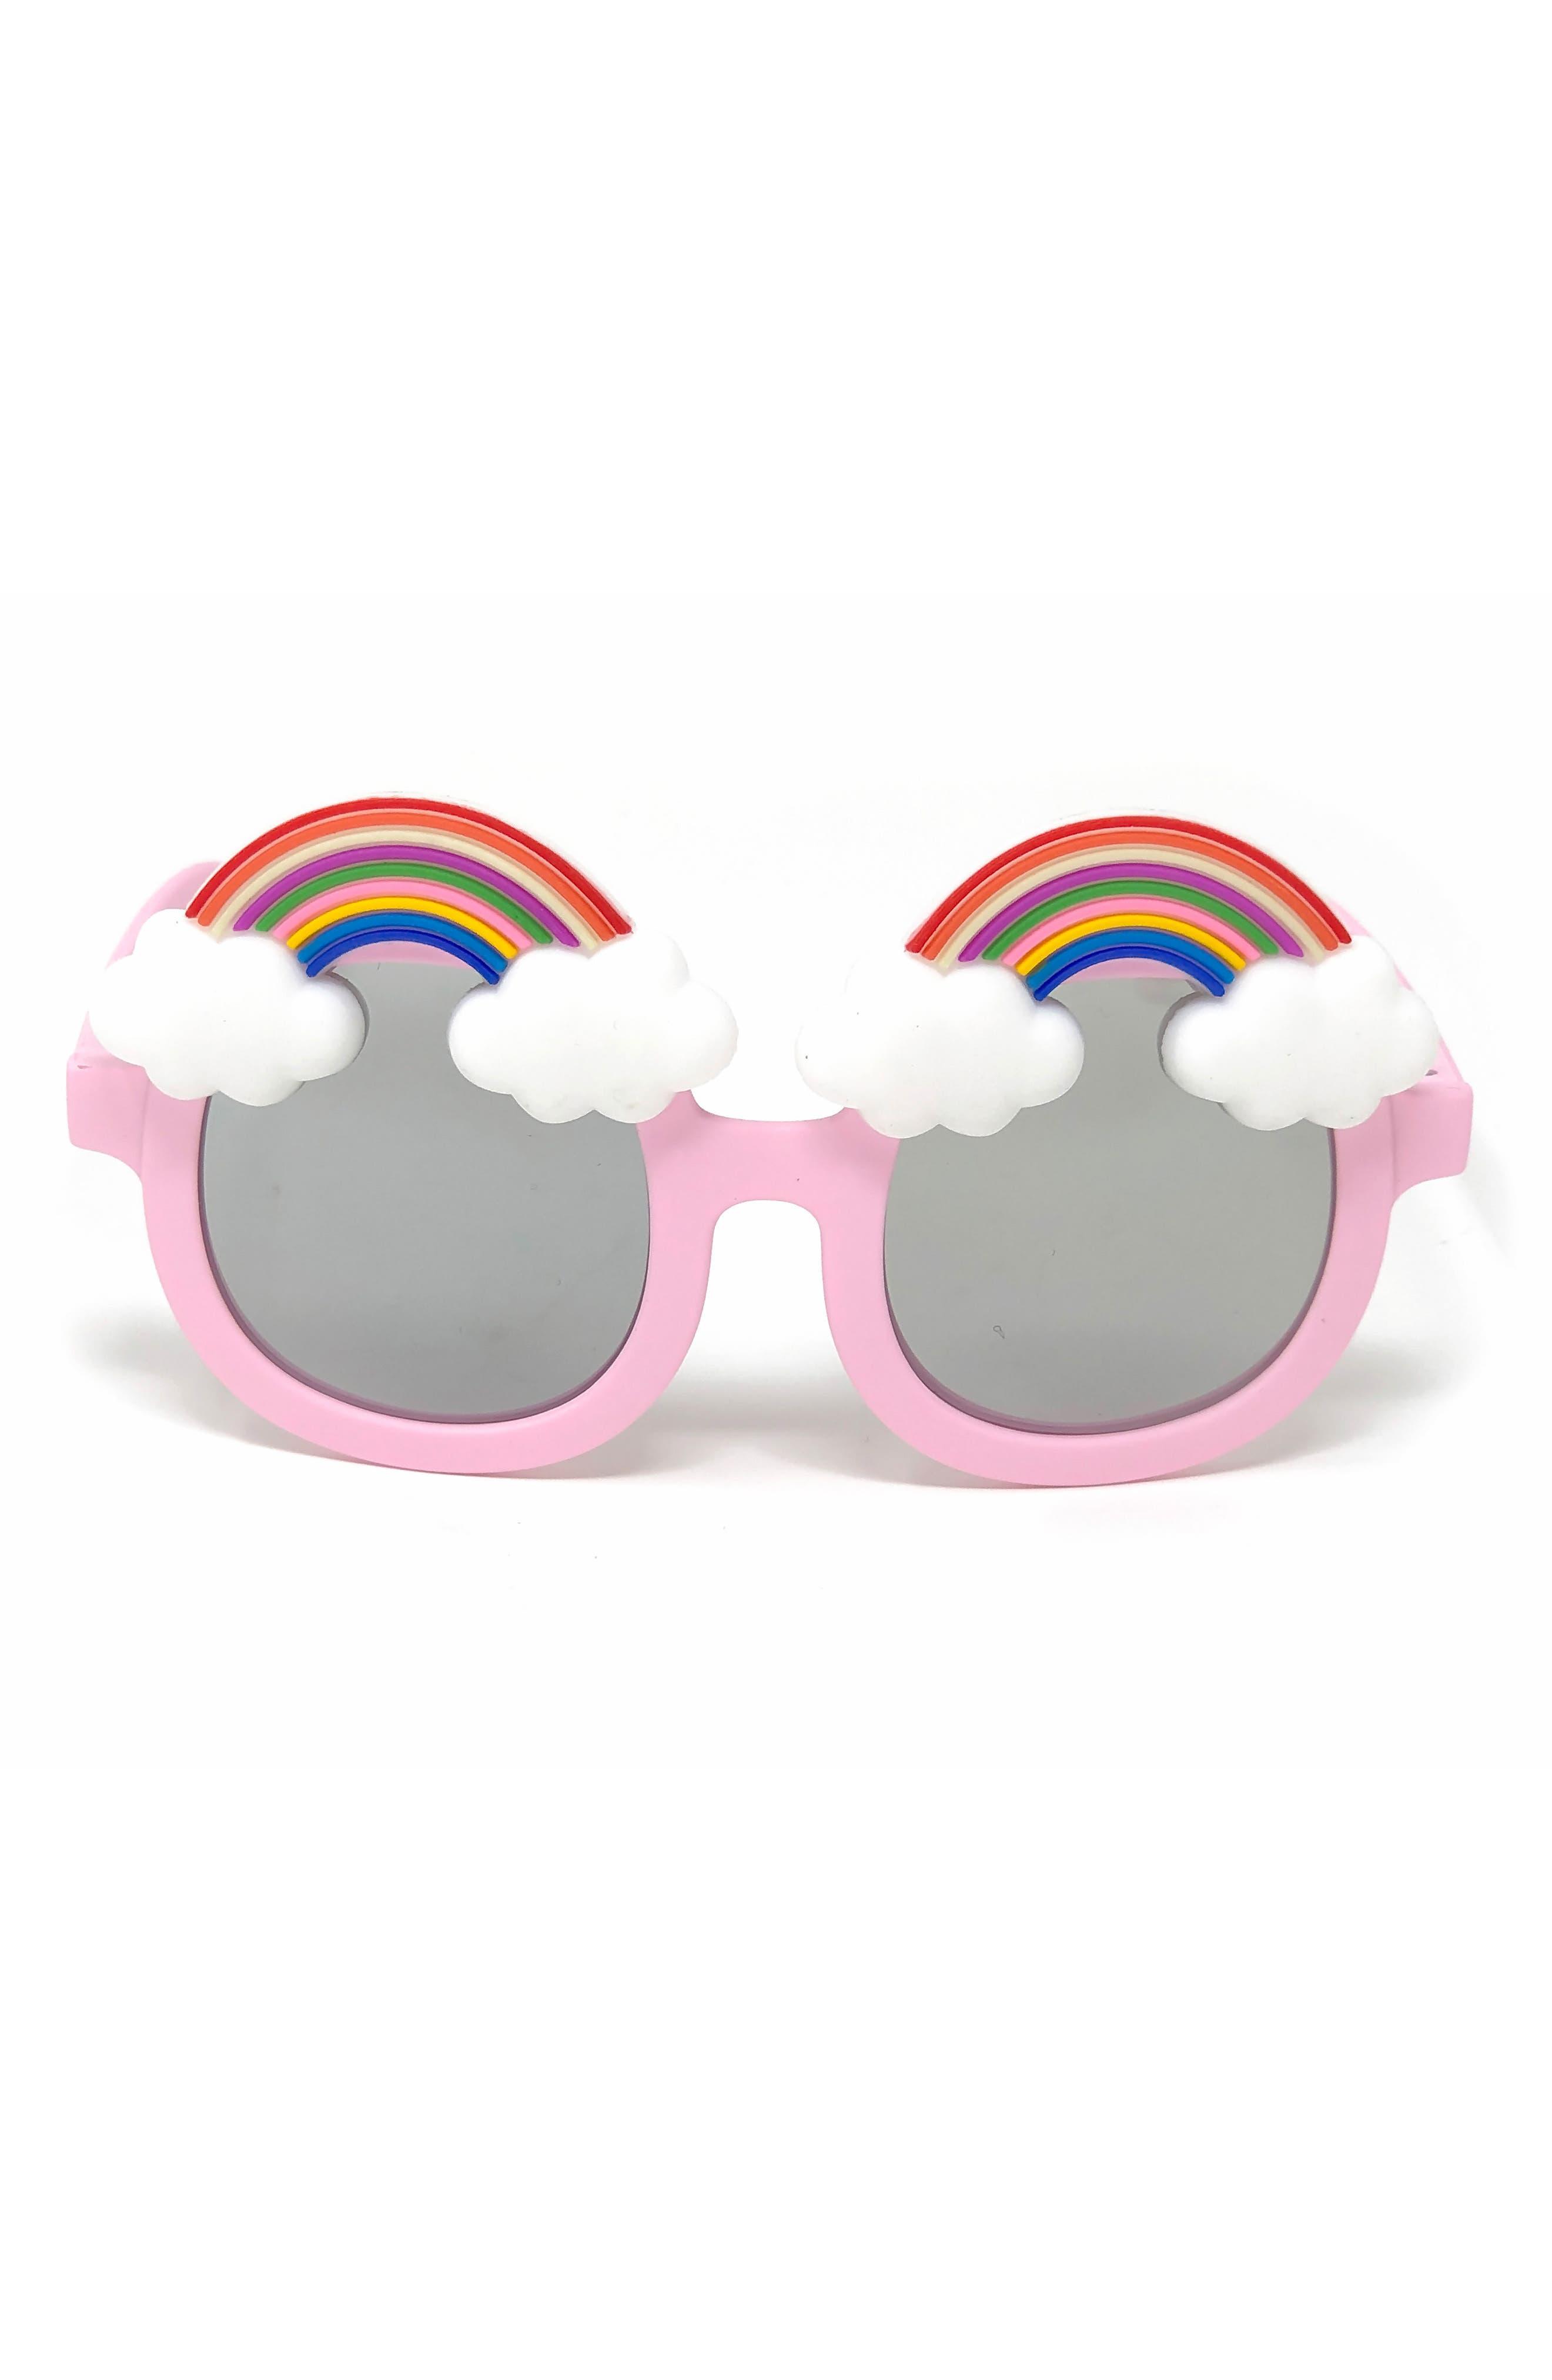 Rainbow Mirrored Sunglasses,                             Alternate thumbnail 3, color,                             PINK